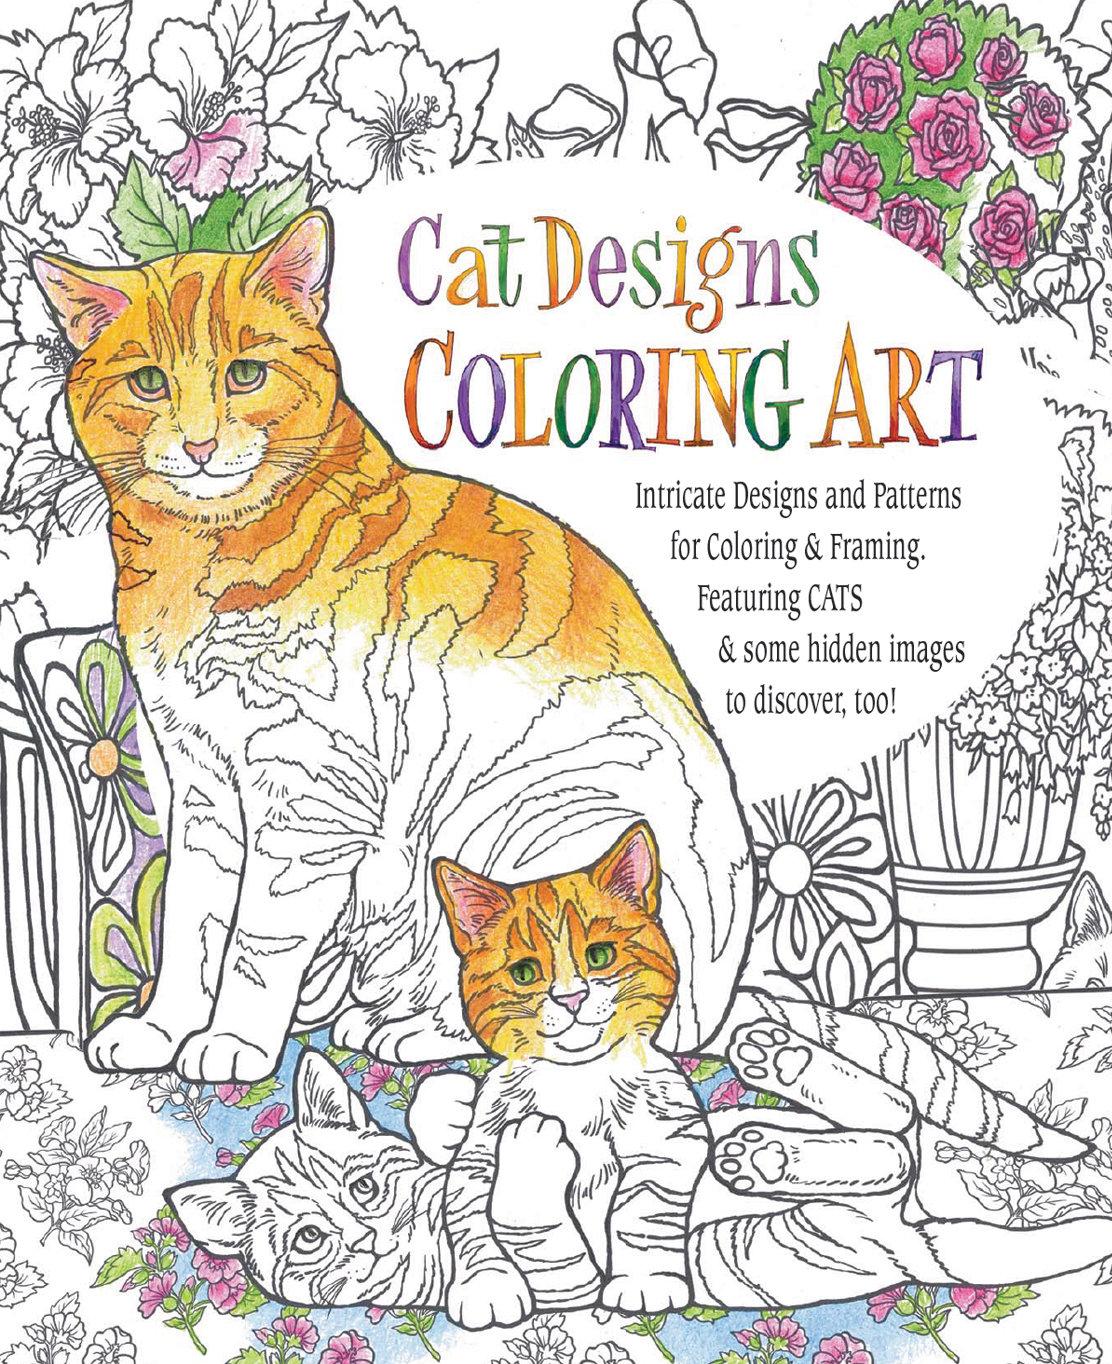 FRG17193  Coloring Book